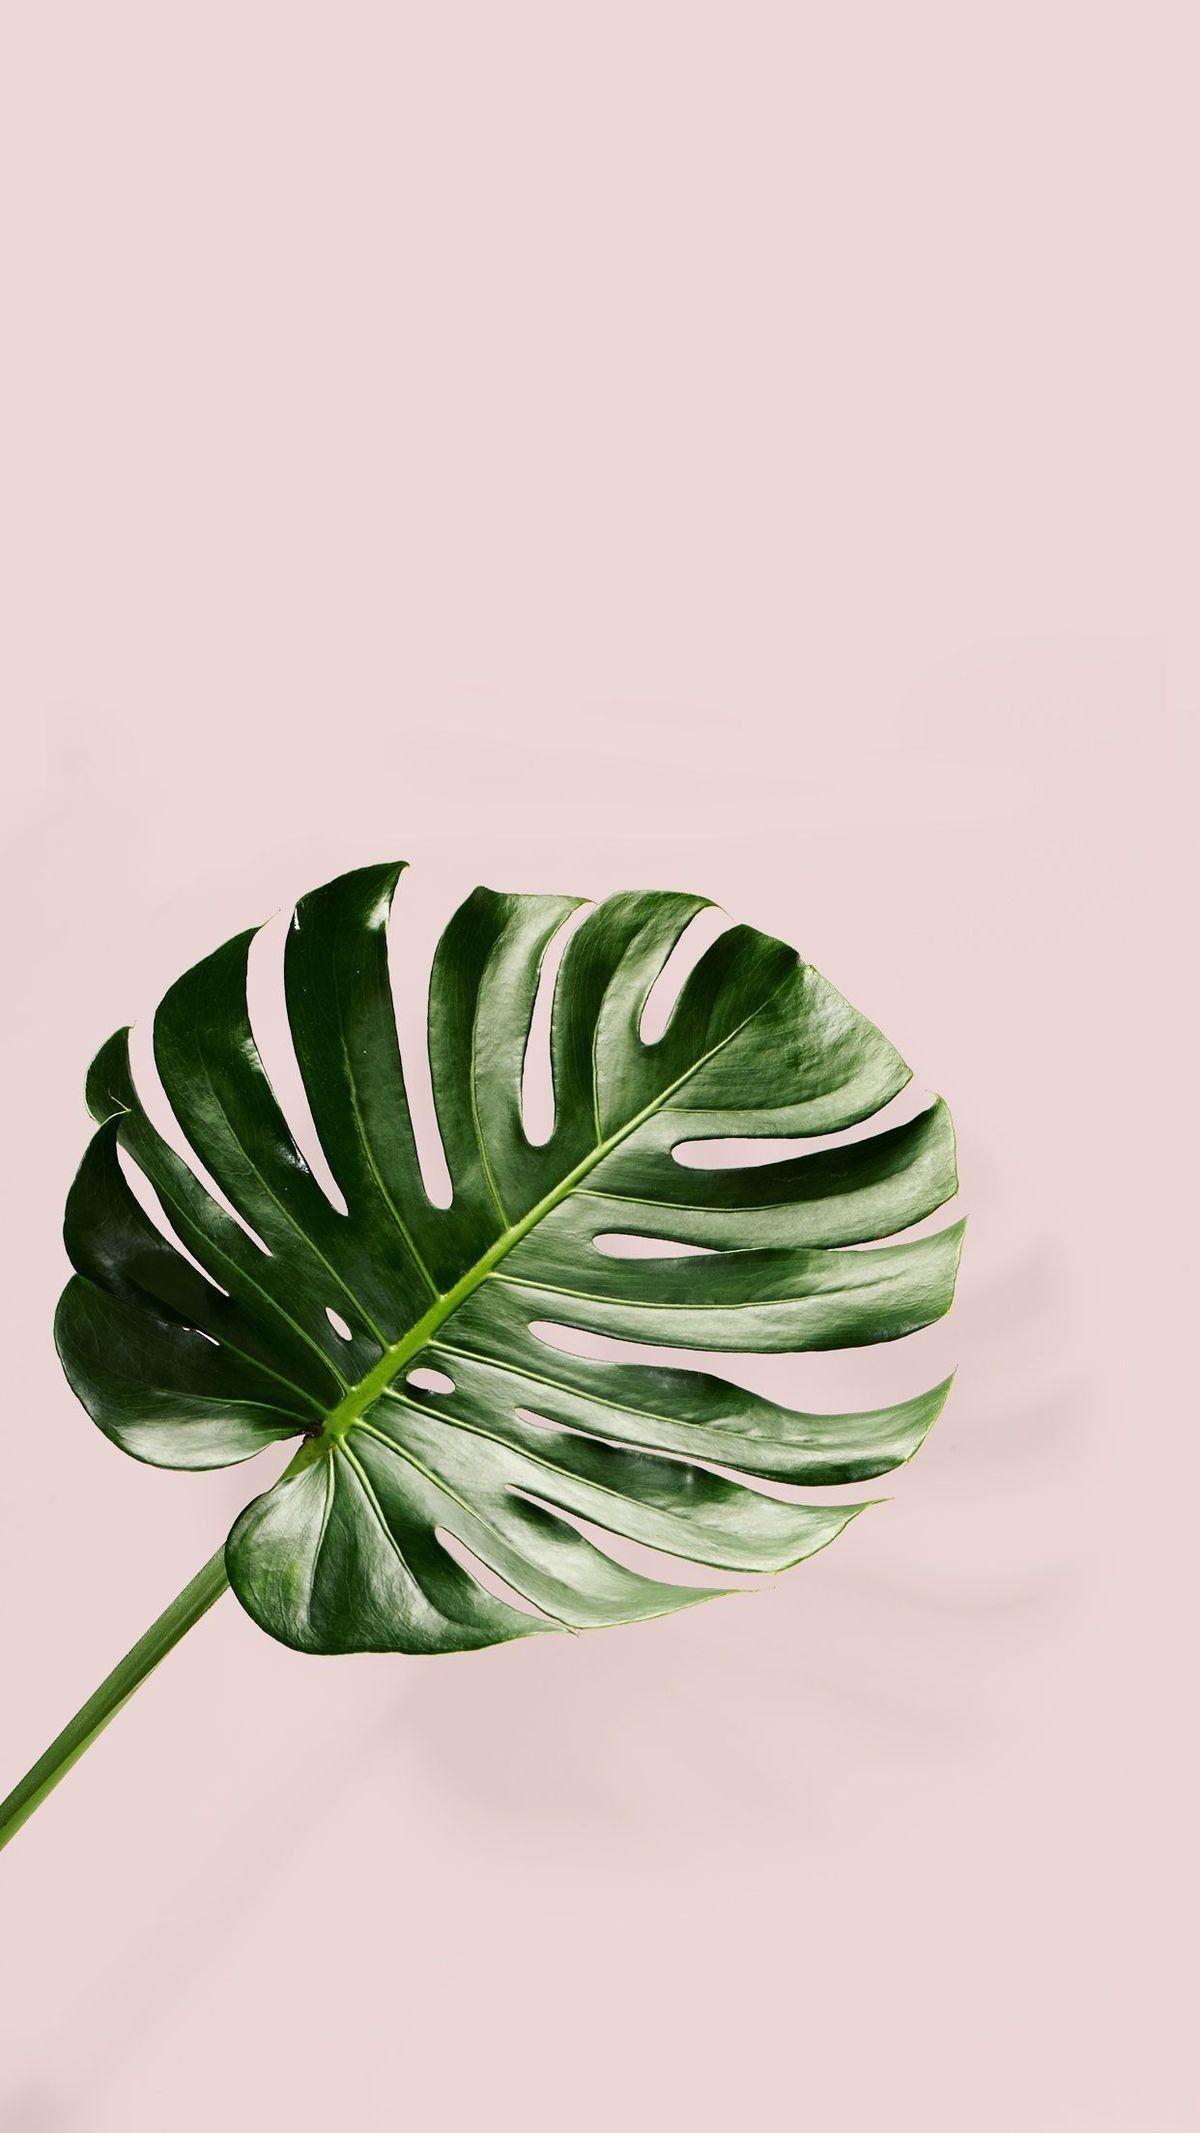 Pin by Fatemeh Ez on Green stuff Plant wallpaper, Leaves